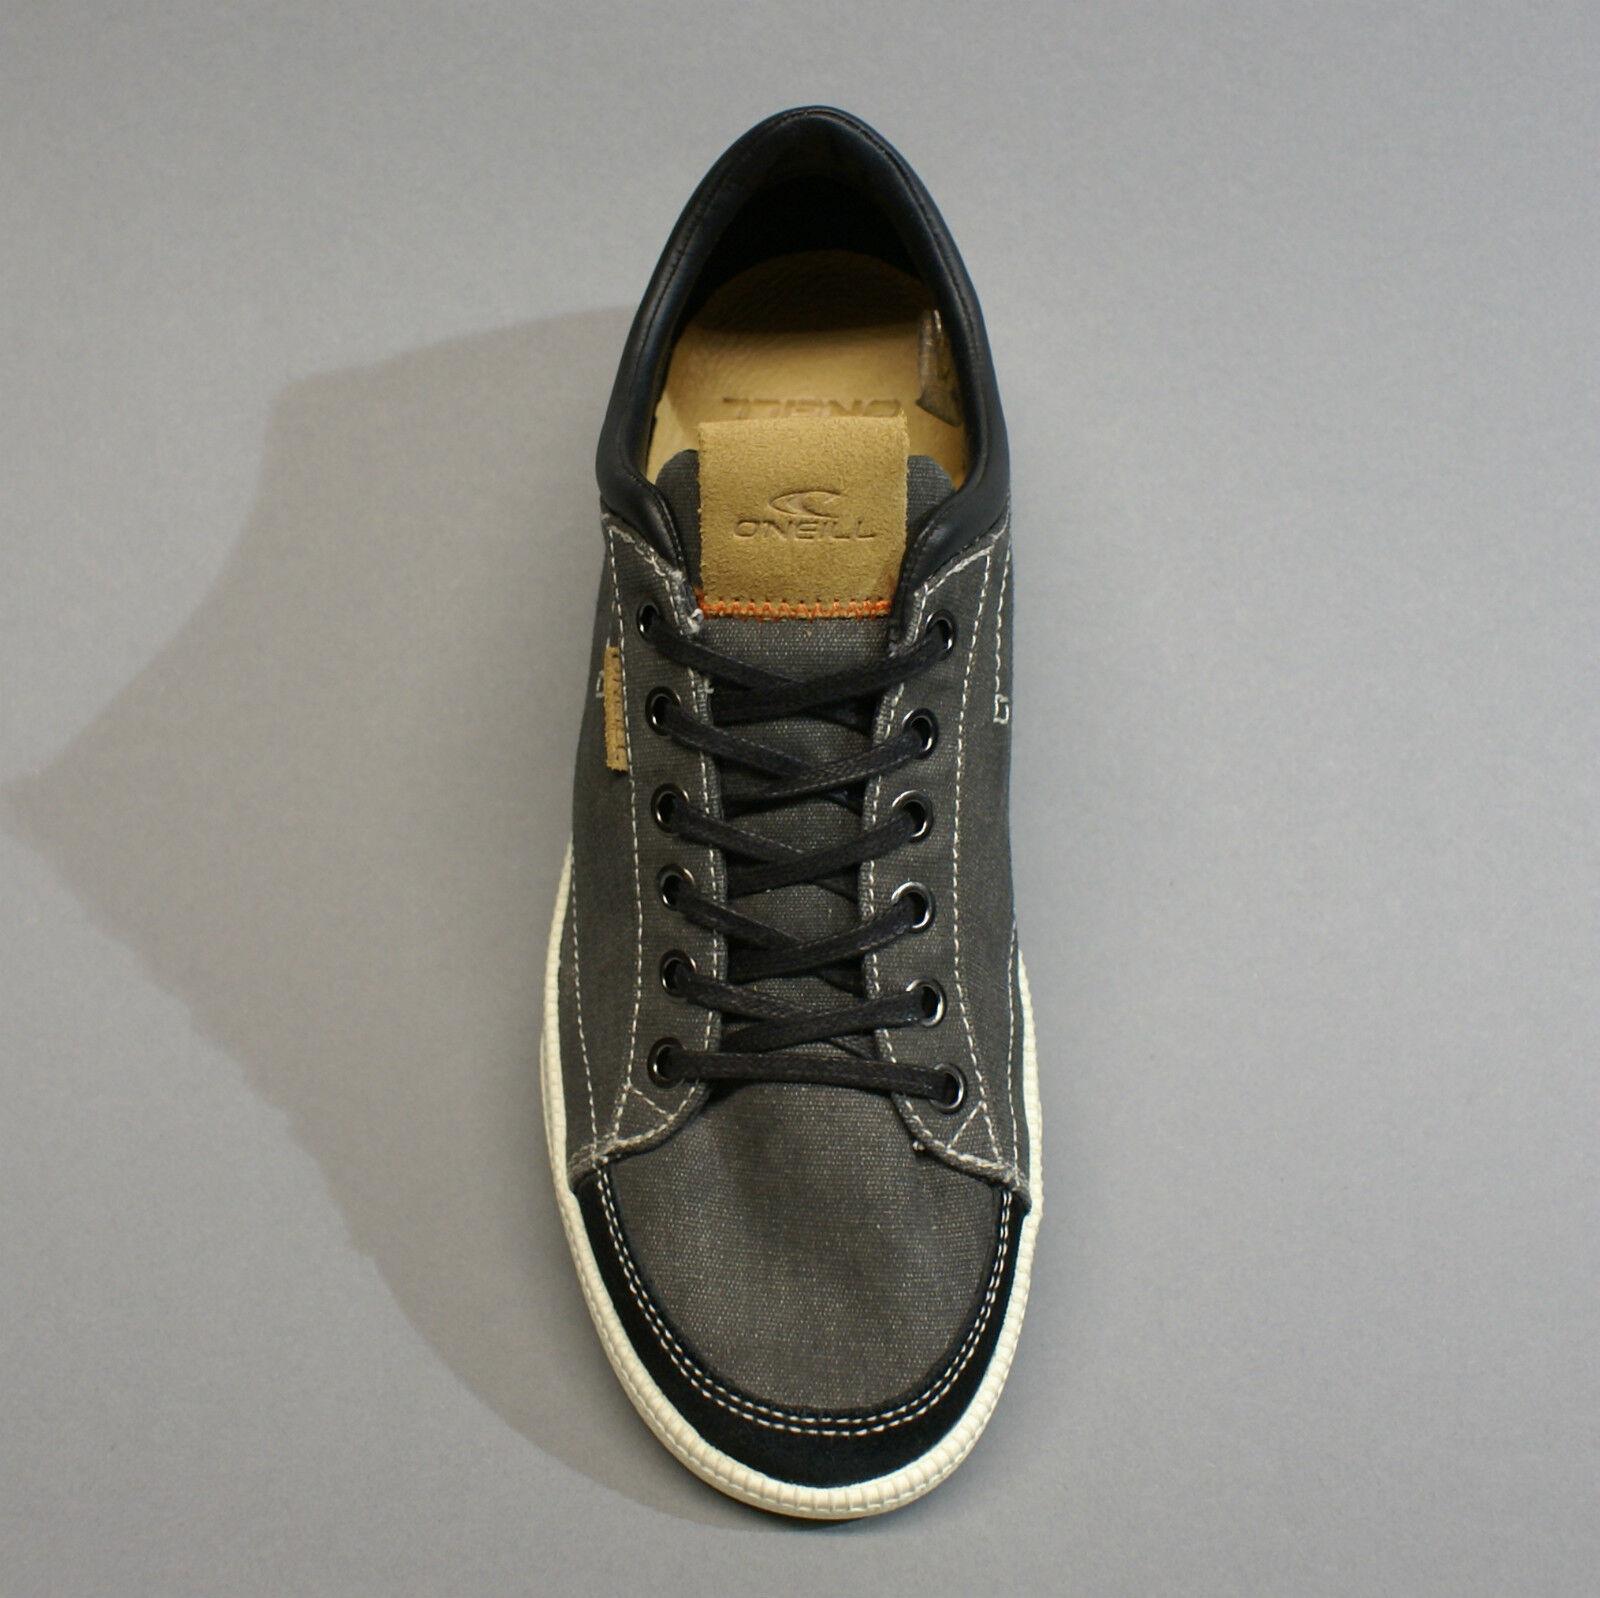 O'Neill Dangle Black 59.1071.01 Turnschuhe Sneakers schwarz grau Textil Gr. 40